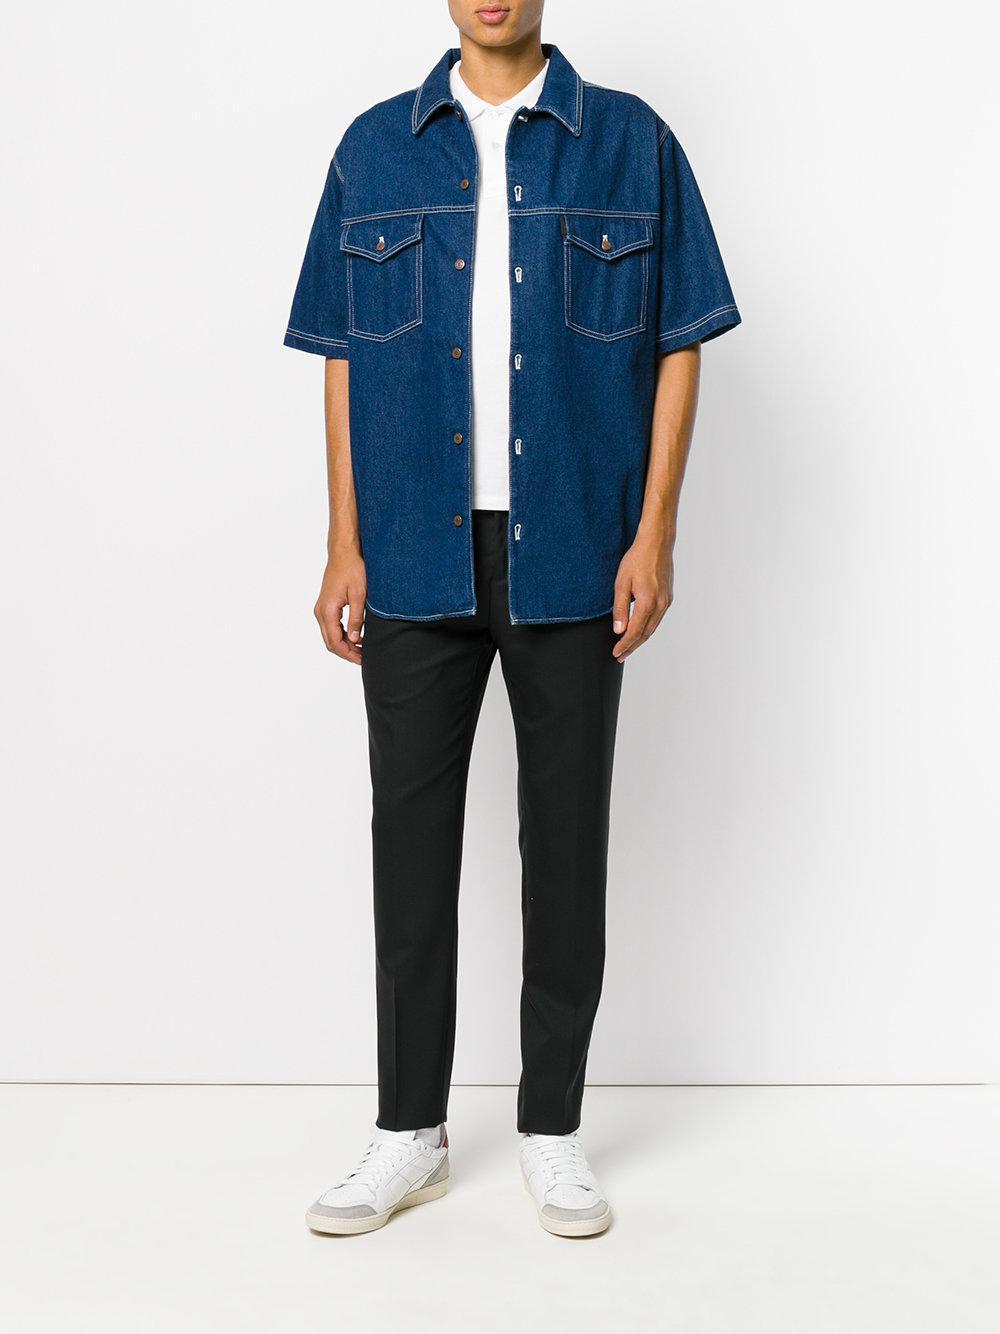 30761a9d83e Lyst - AMI Oversized Denim Shirt in Blue for Men